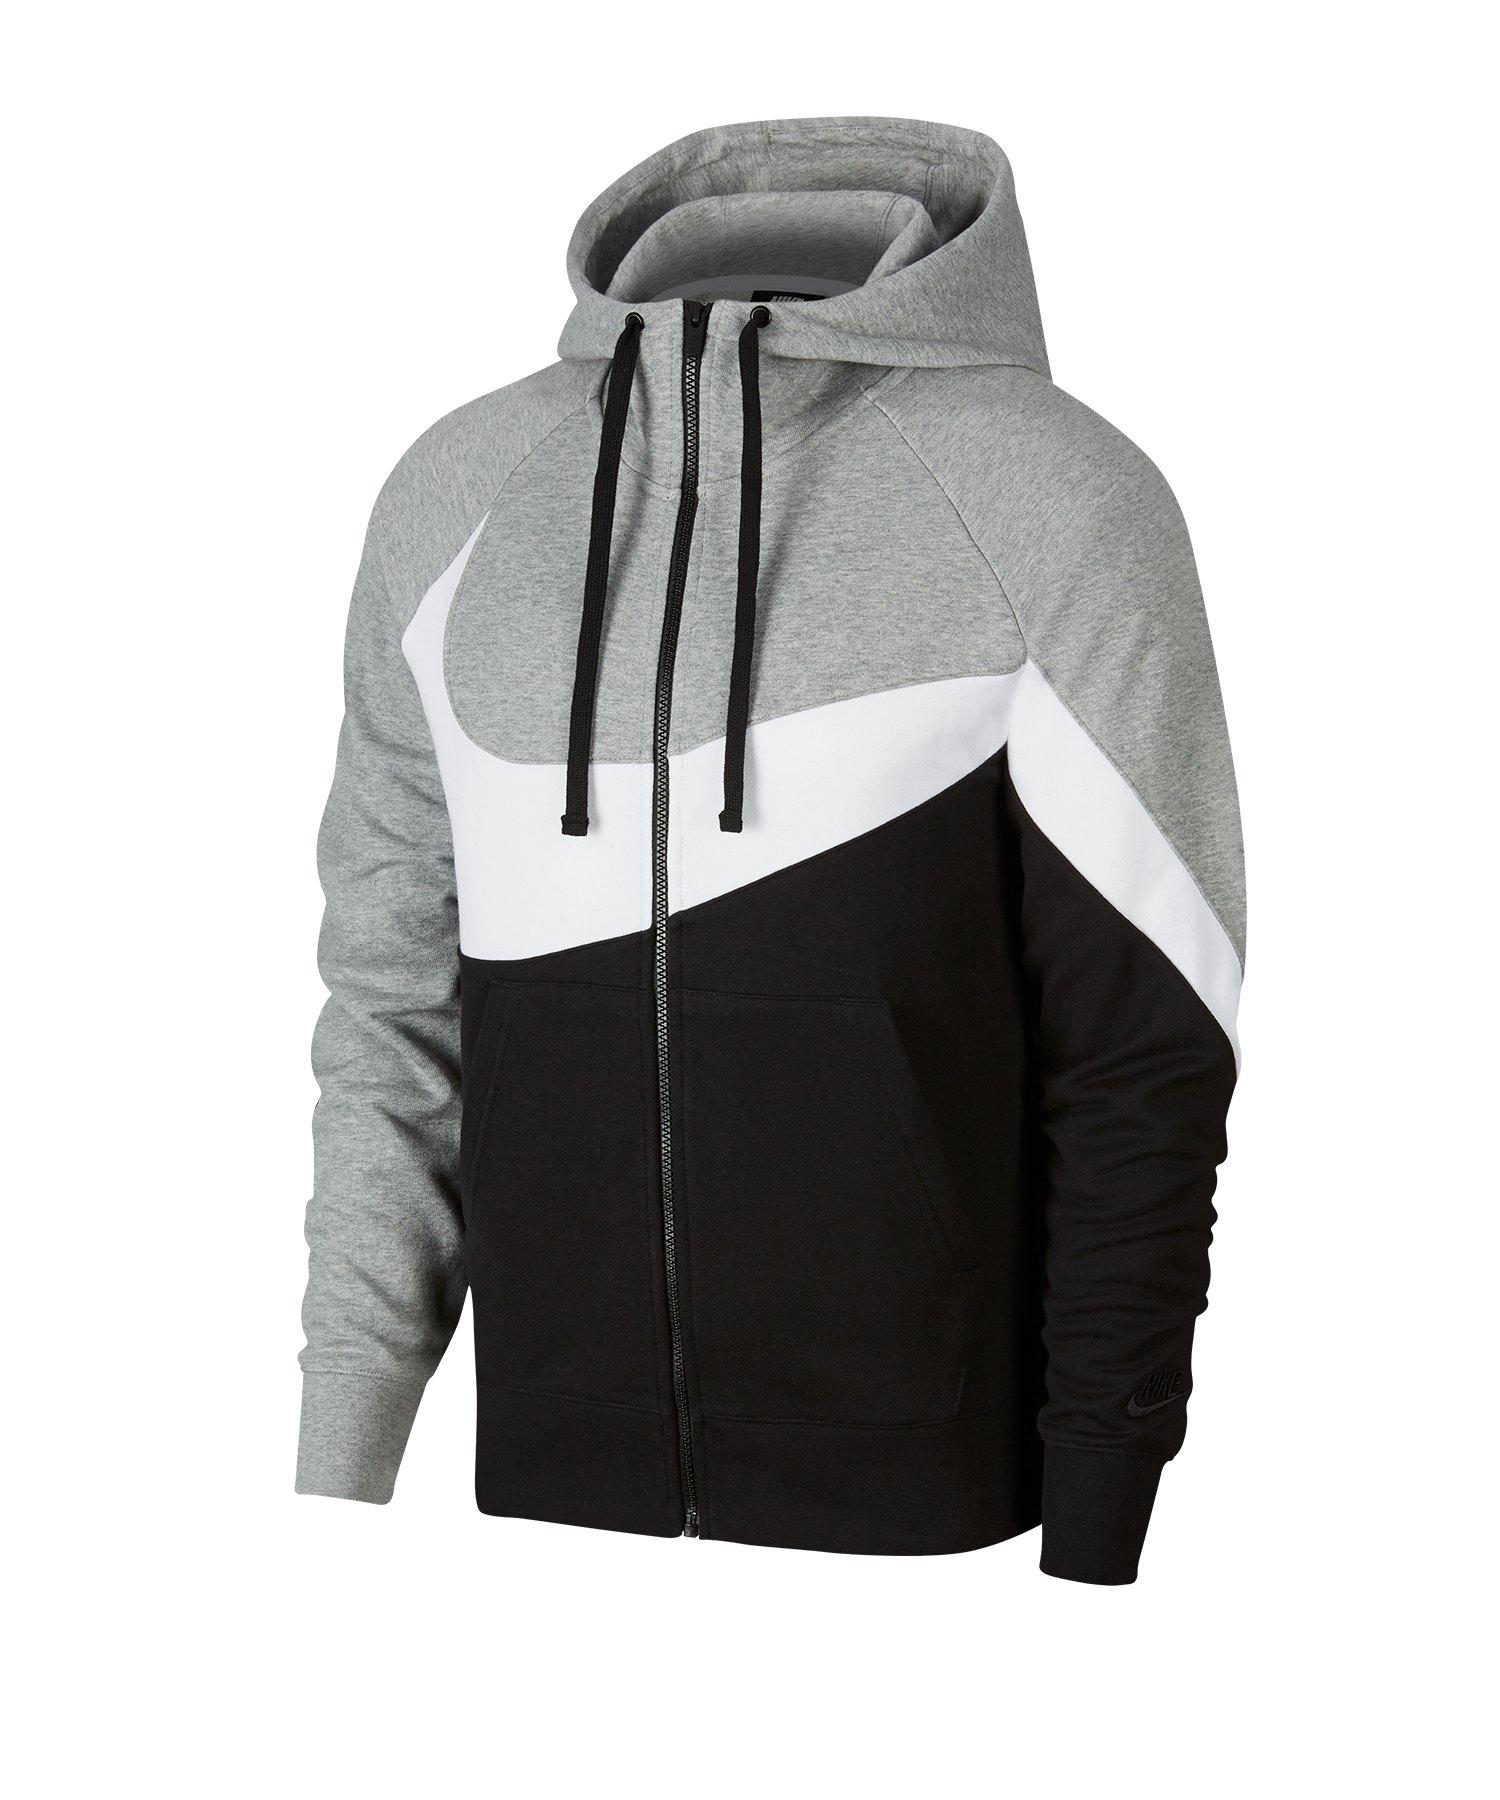 Nike Statement Fullzip Kapuzenjacke Grau F063 - grau